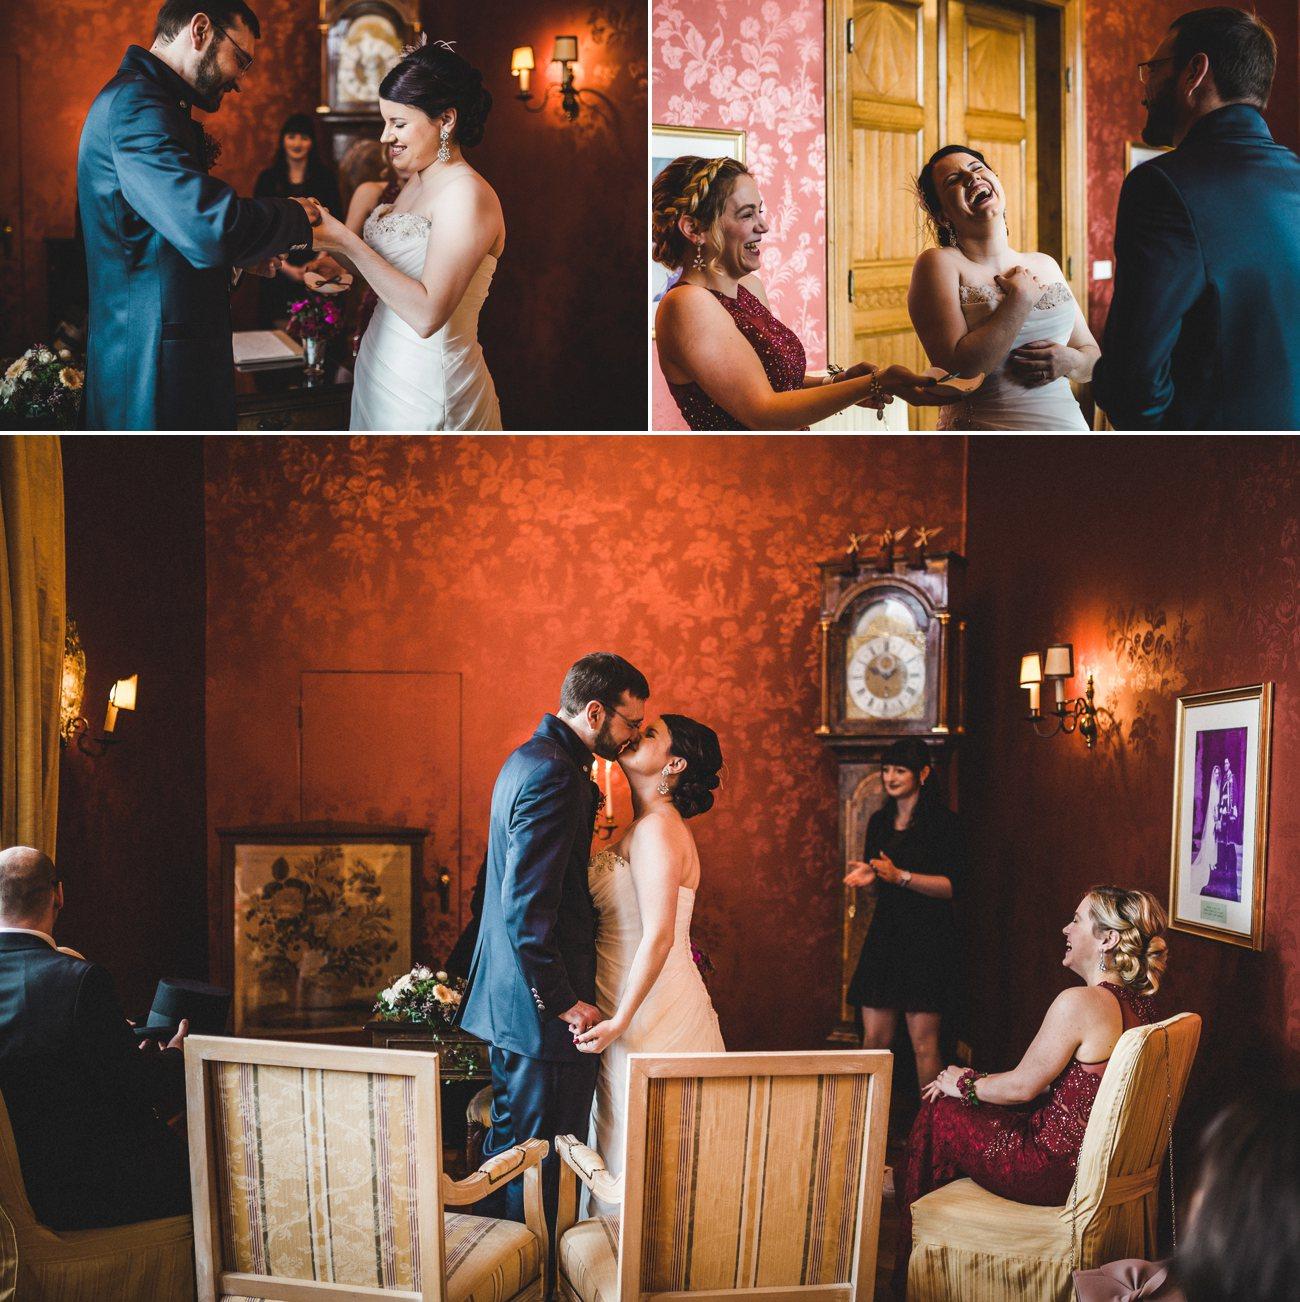 Hochzeitsfotograf_Schloss_Luebbenau 25